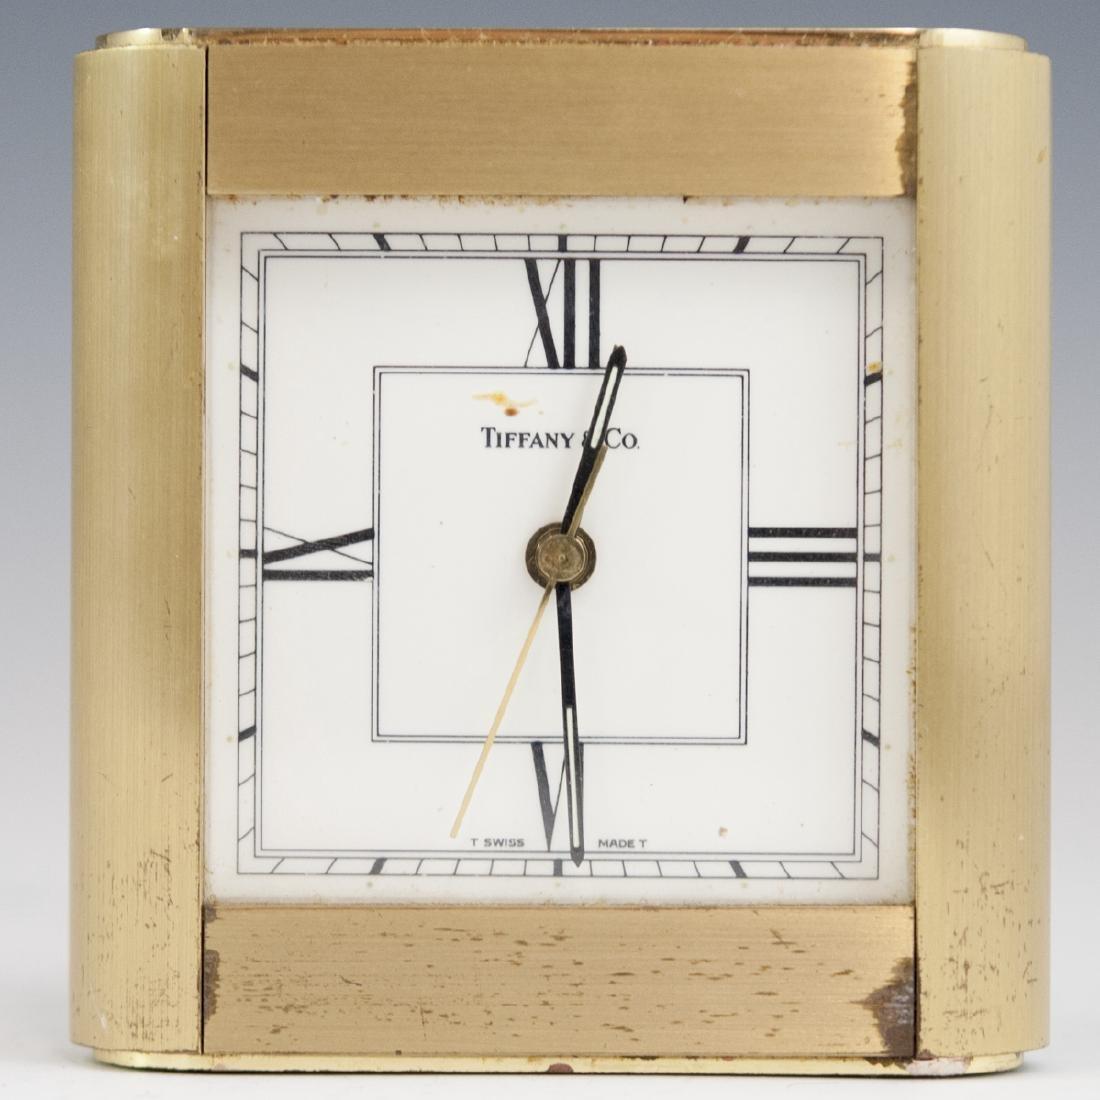 Tiffany & Co. Brass Clock